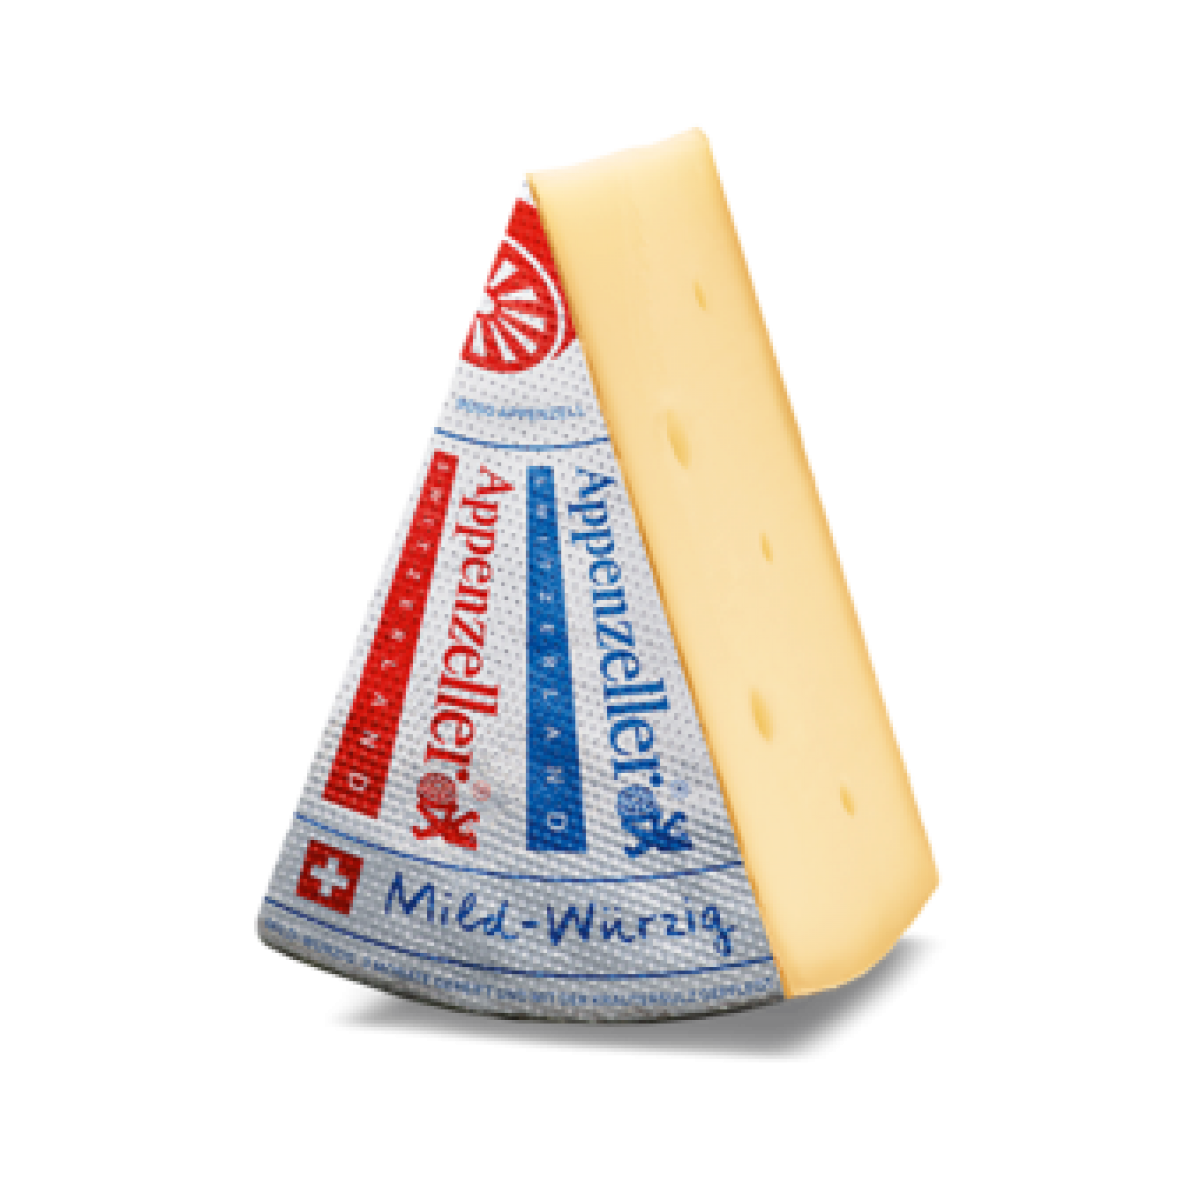 Appenzeller - mild